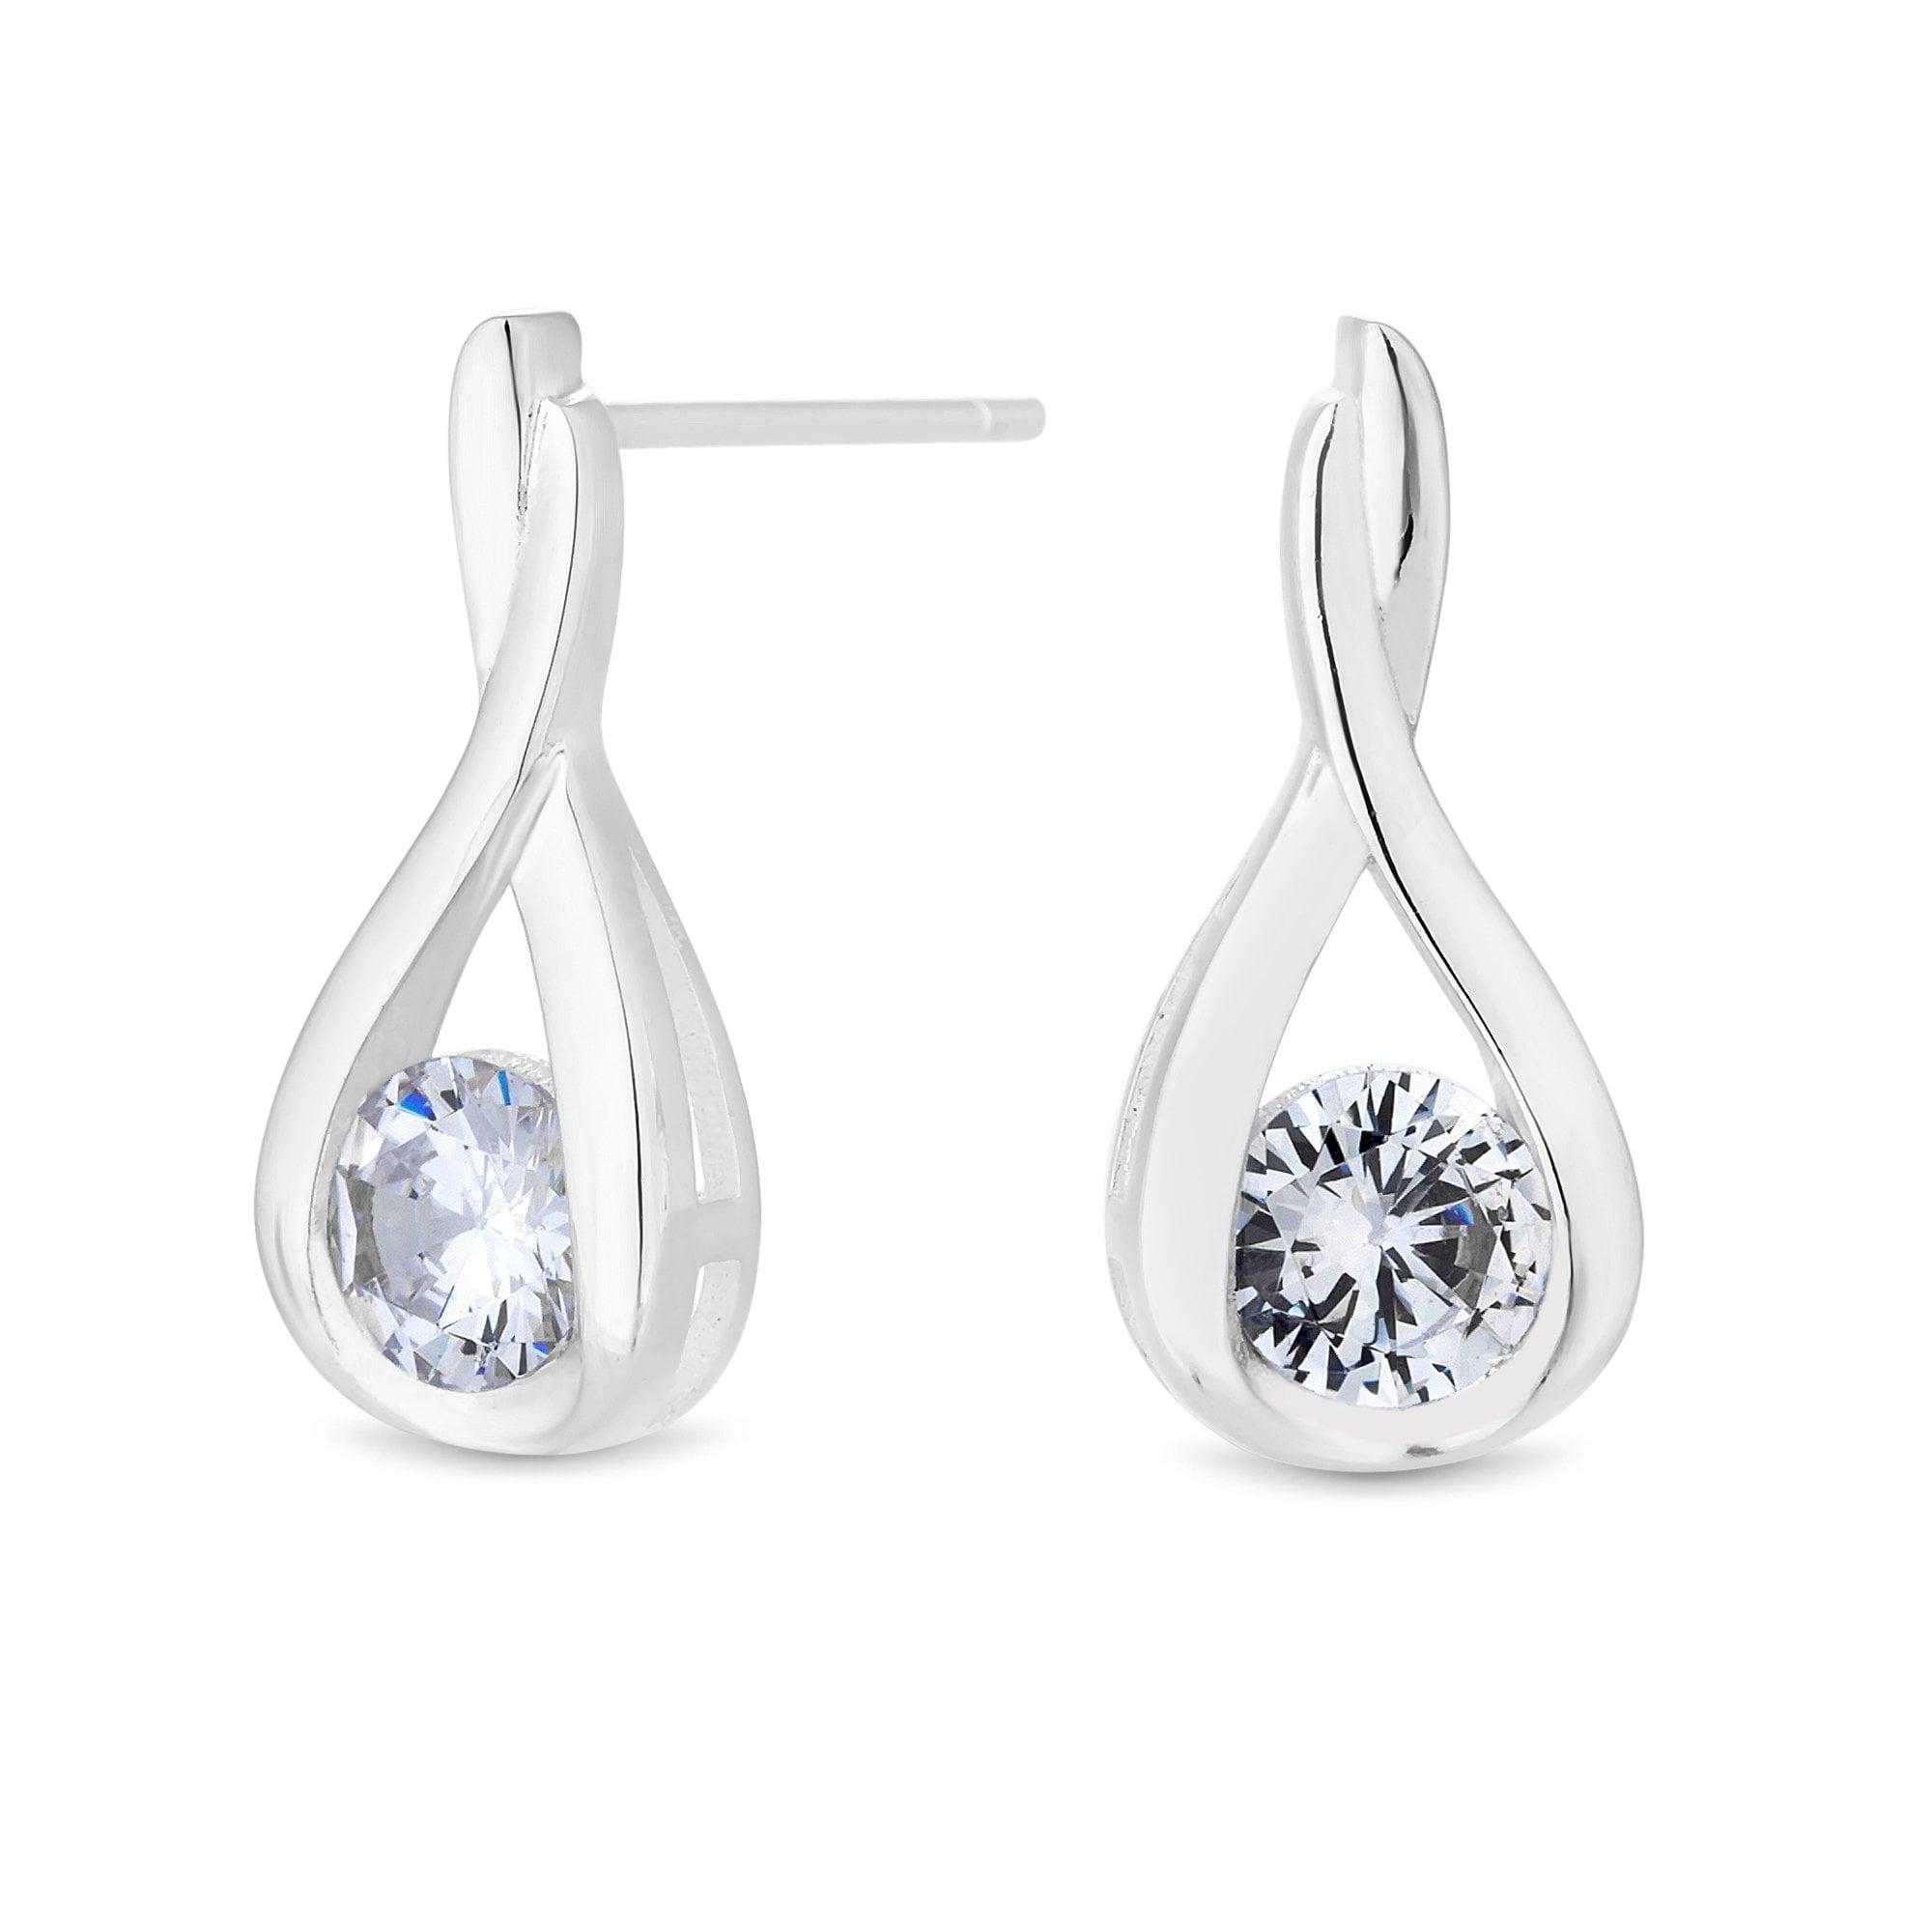 3ebd8f5218881 Sterling Silver 925 Cubic Zirconia Solitaire Twist Drop Earring